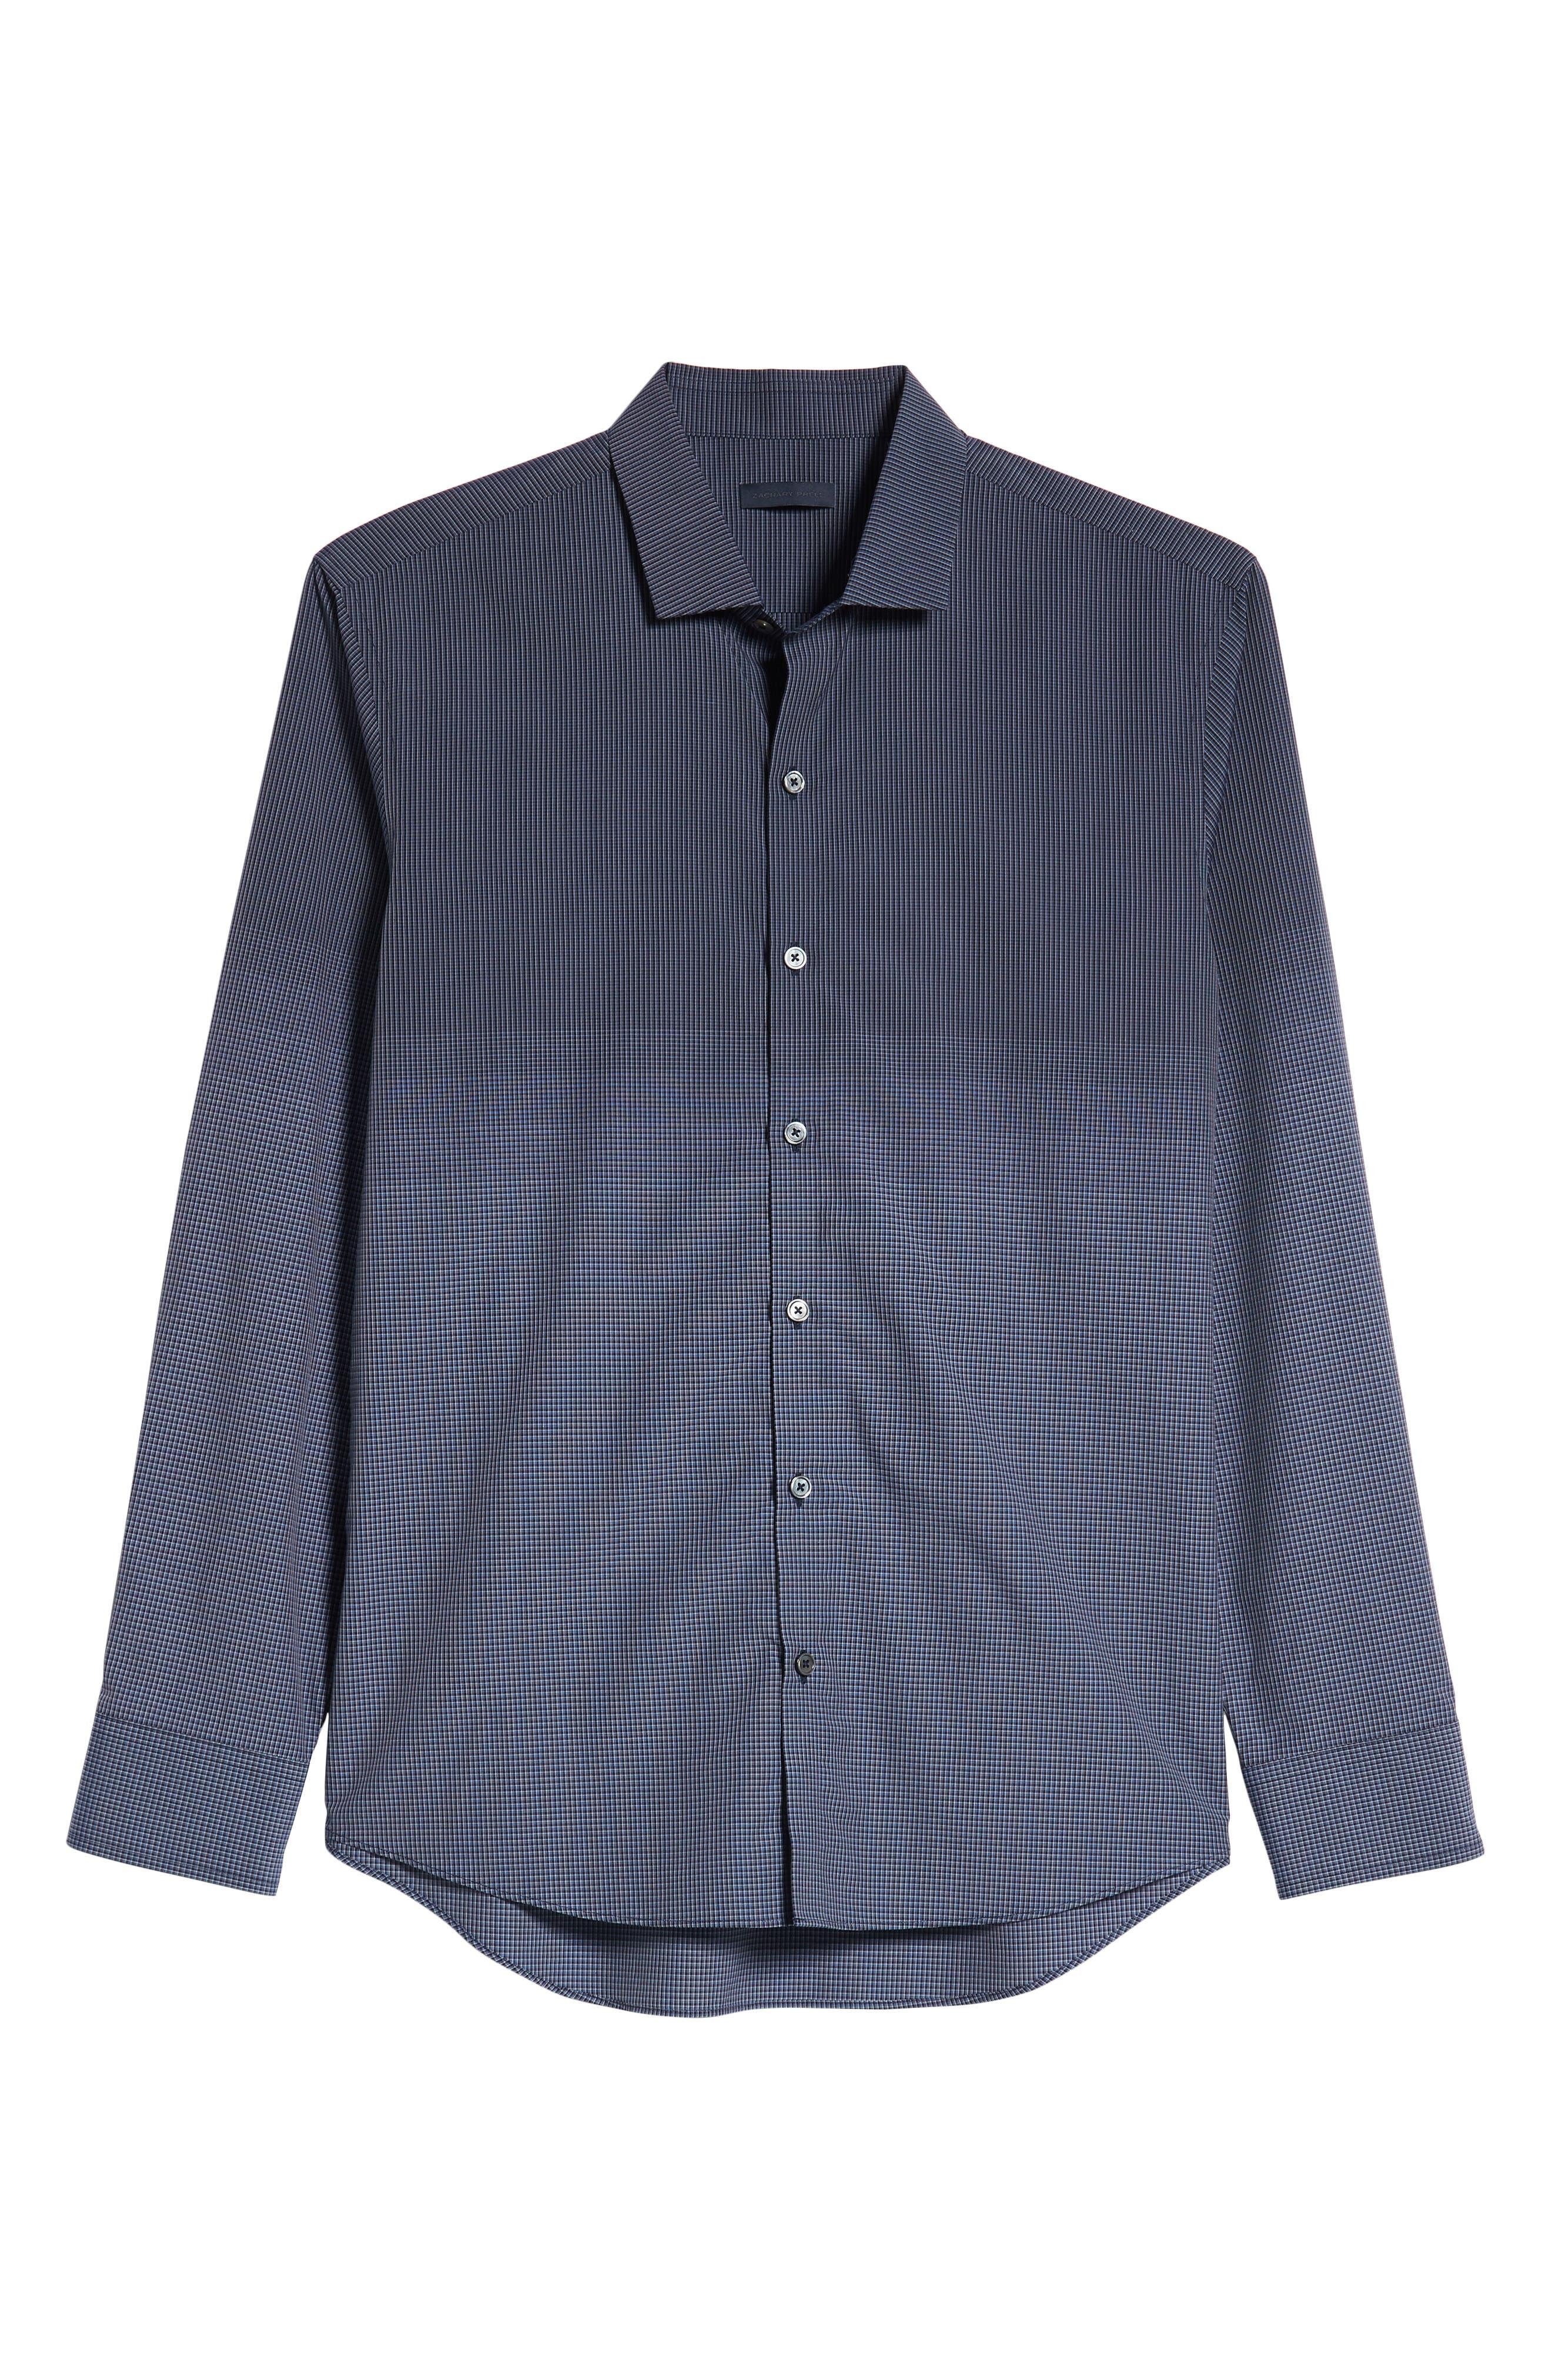 Hong Regular Fit Sport Shirt,                             Alternate thumbnail 5, color,                             NAVY